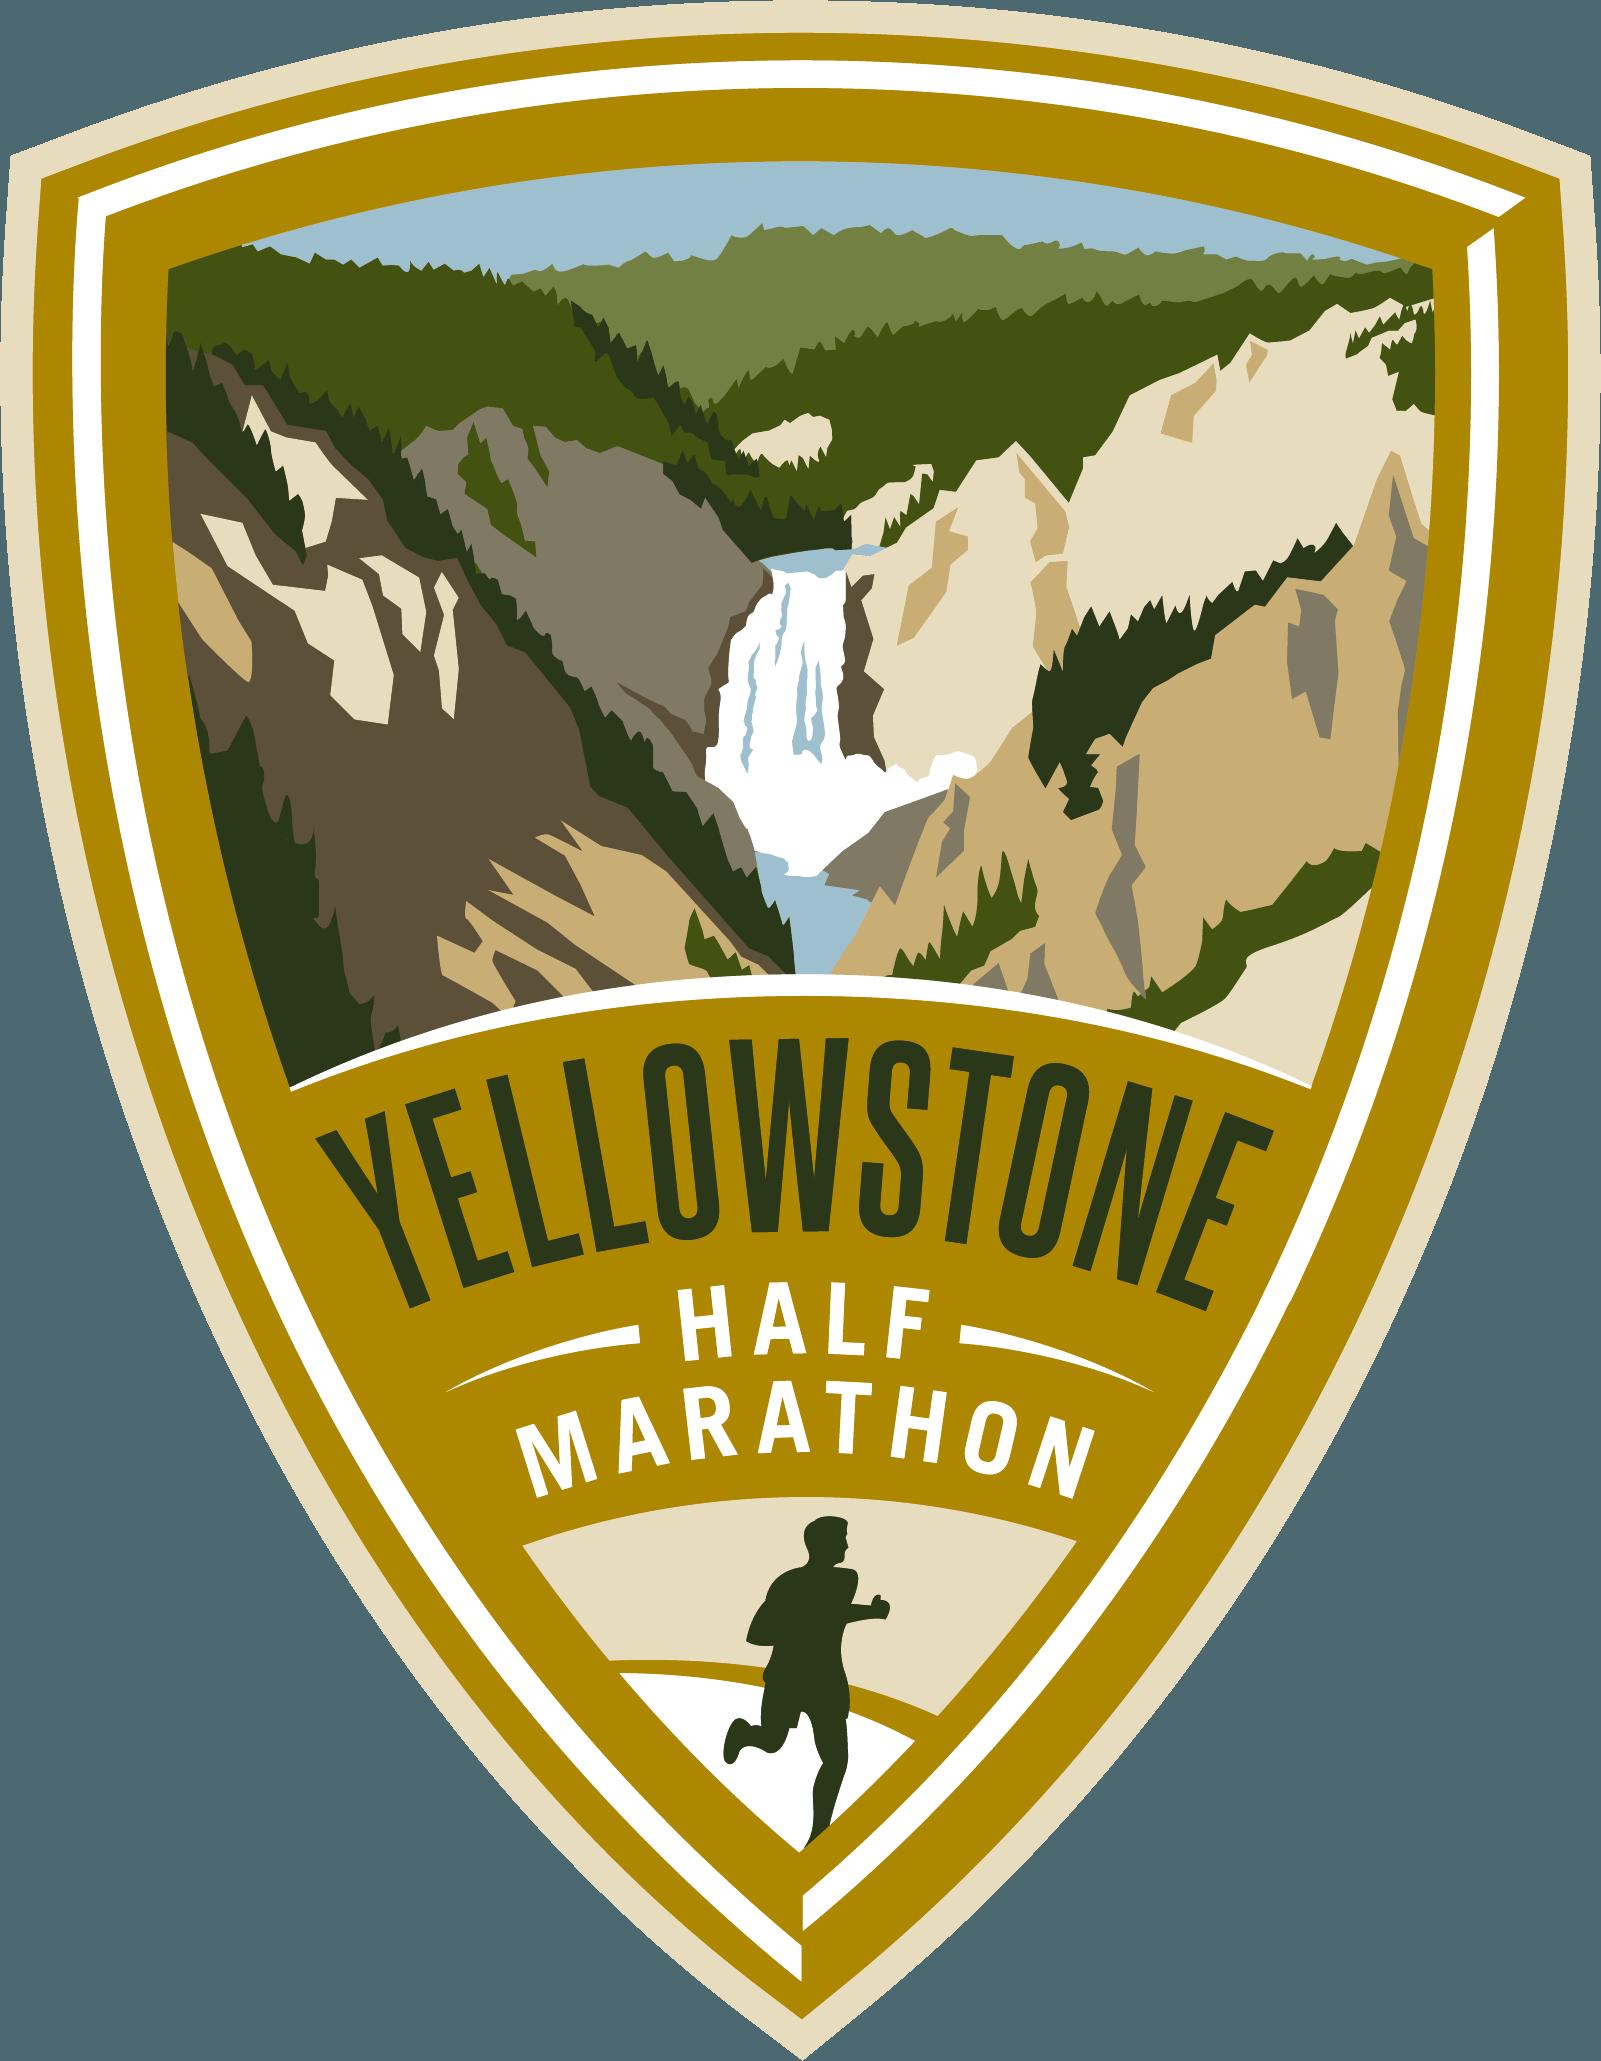 Yellowstone Half Marathon logo